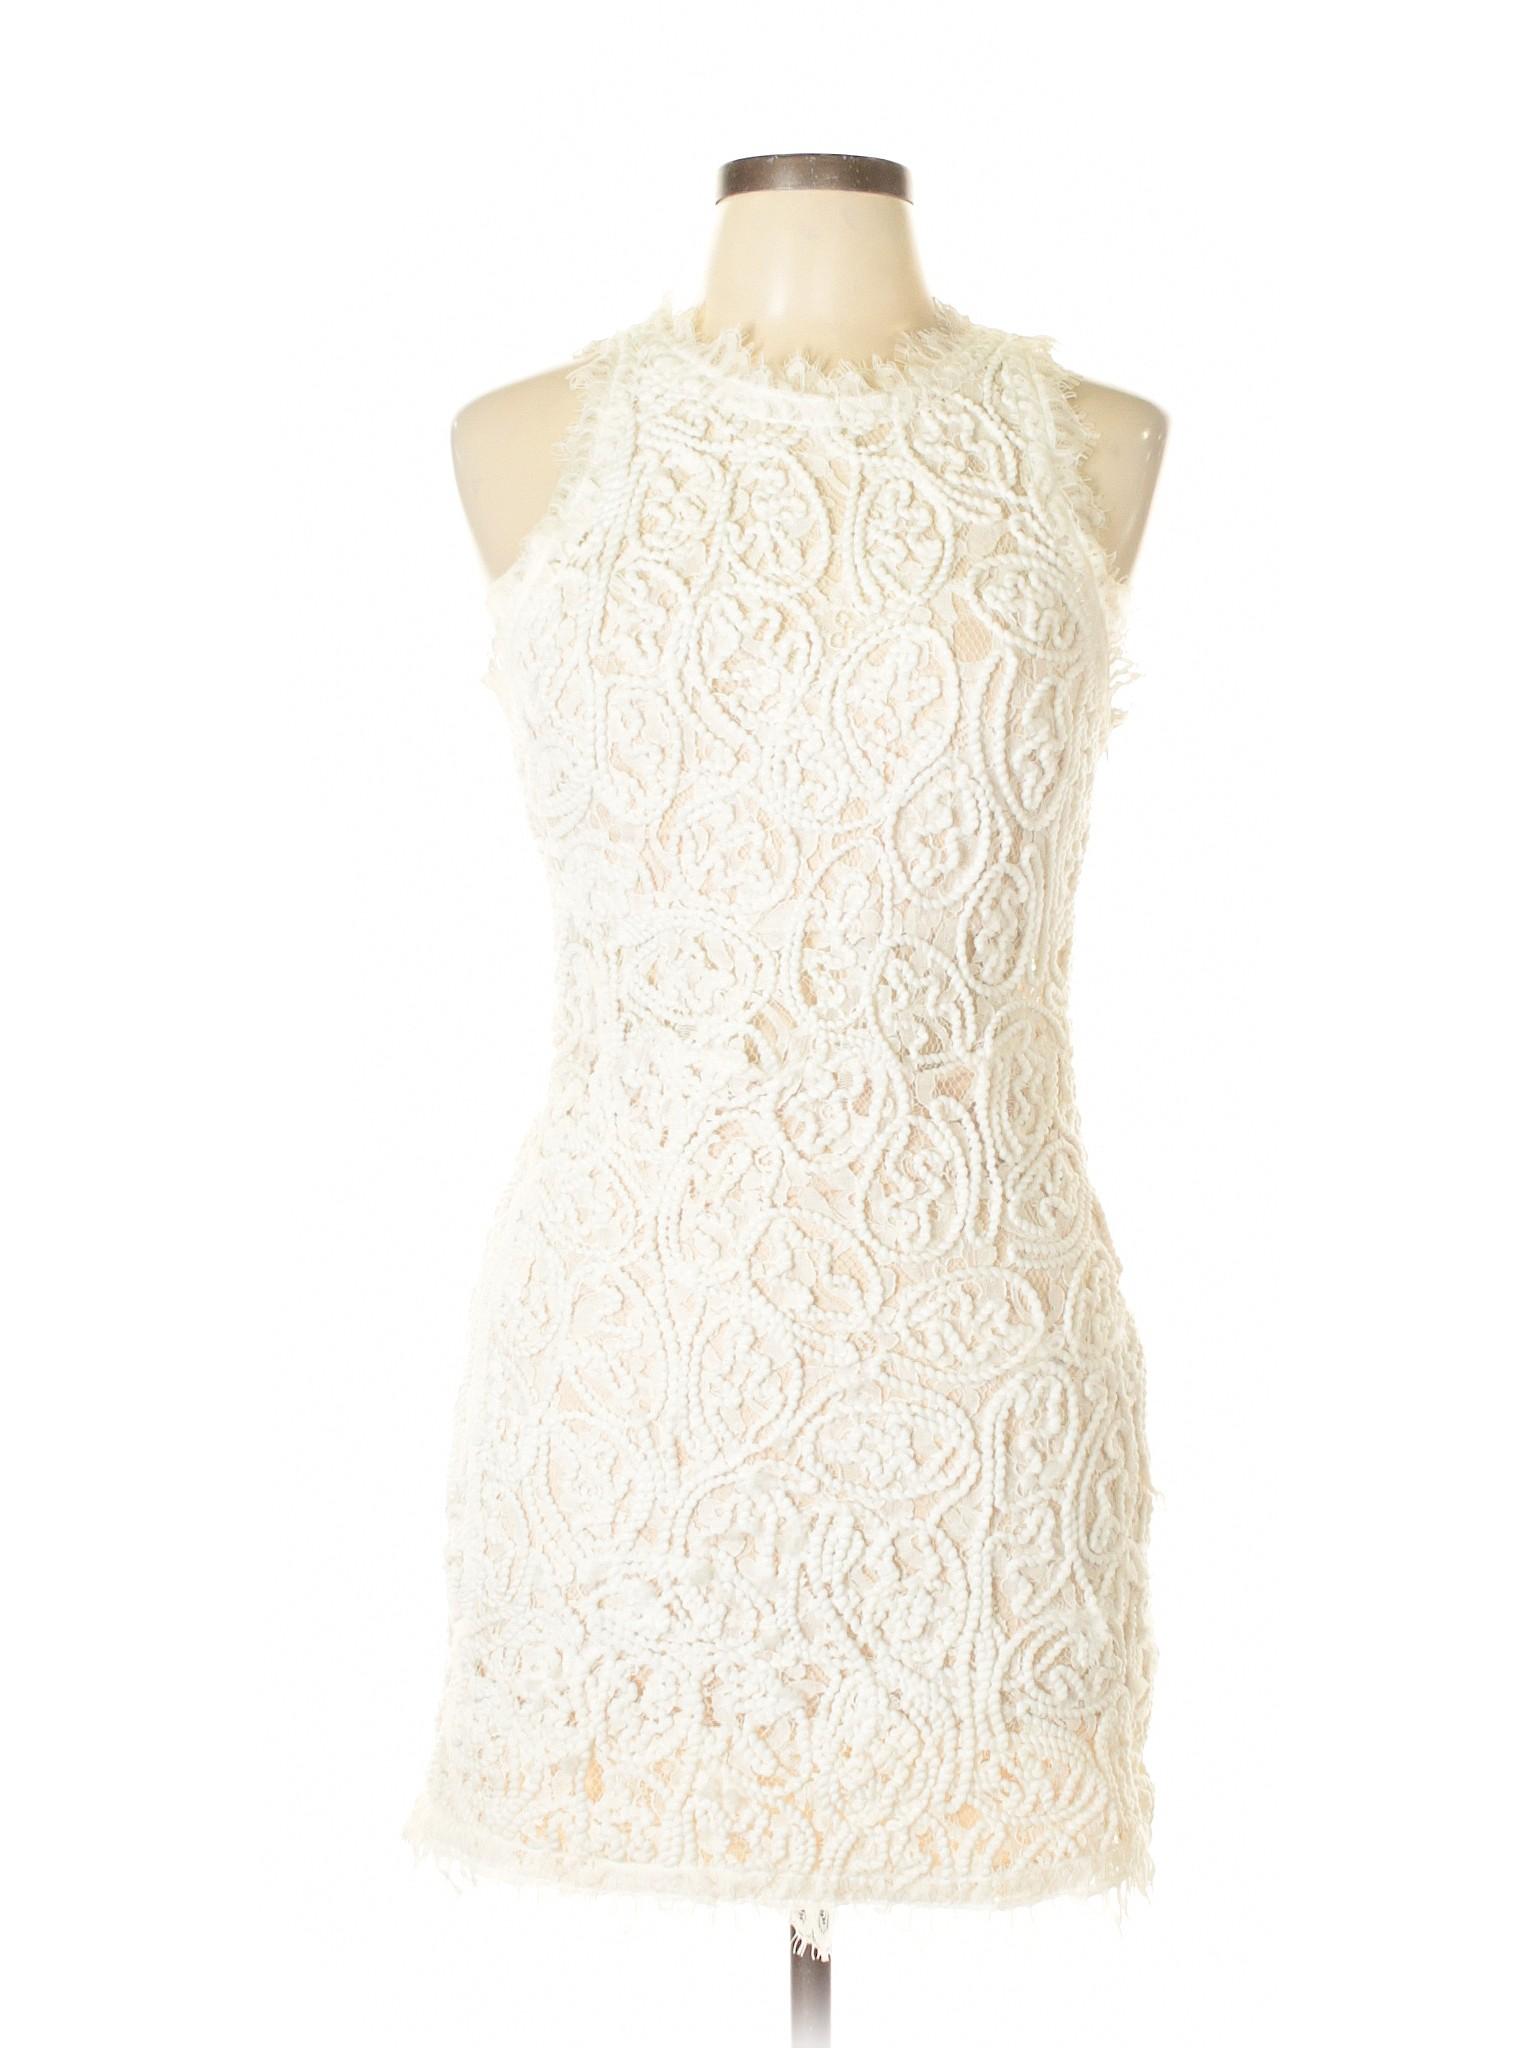 Casual Casual Winter Peach Boutique Dress A RFqxw6